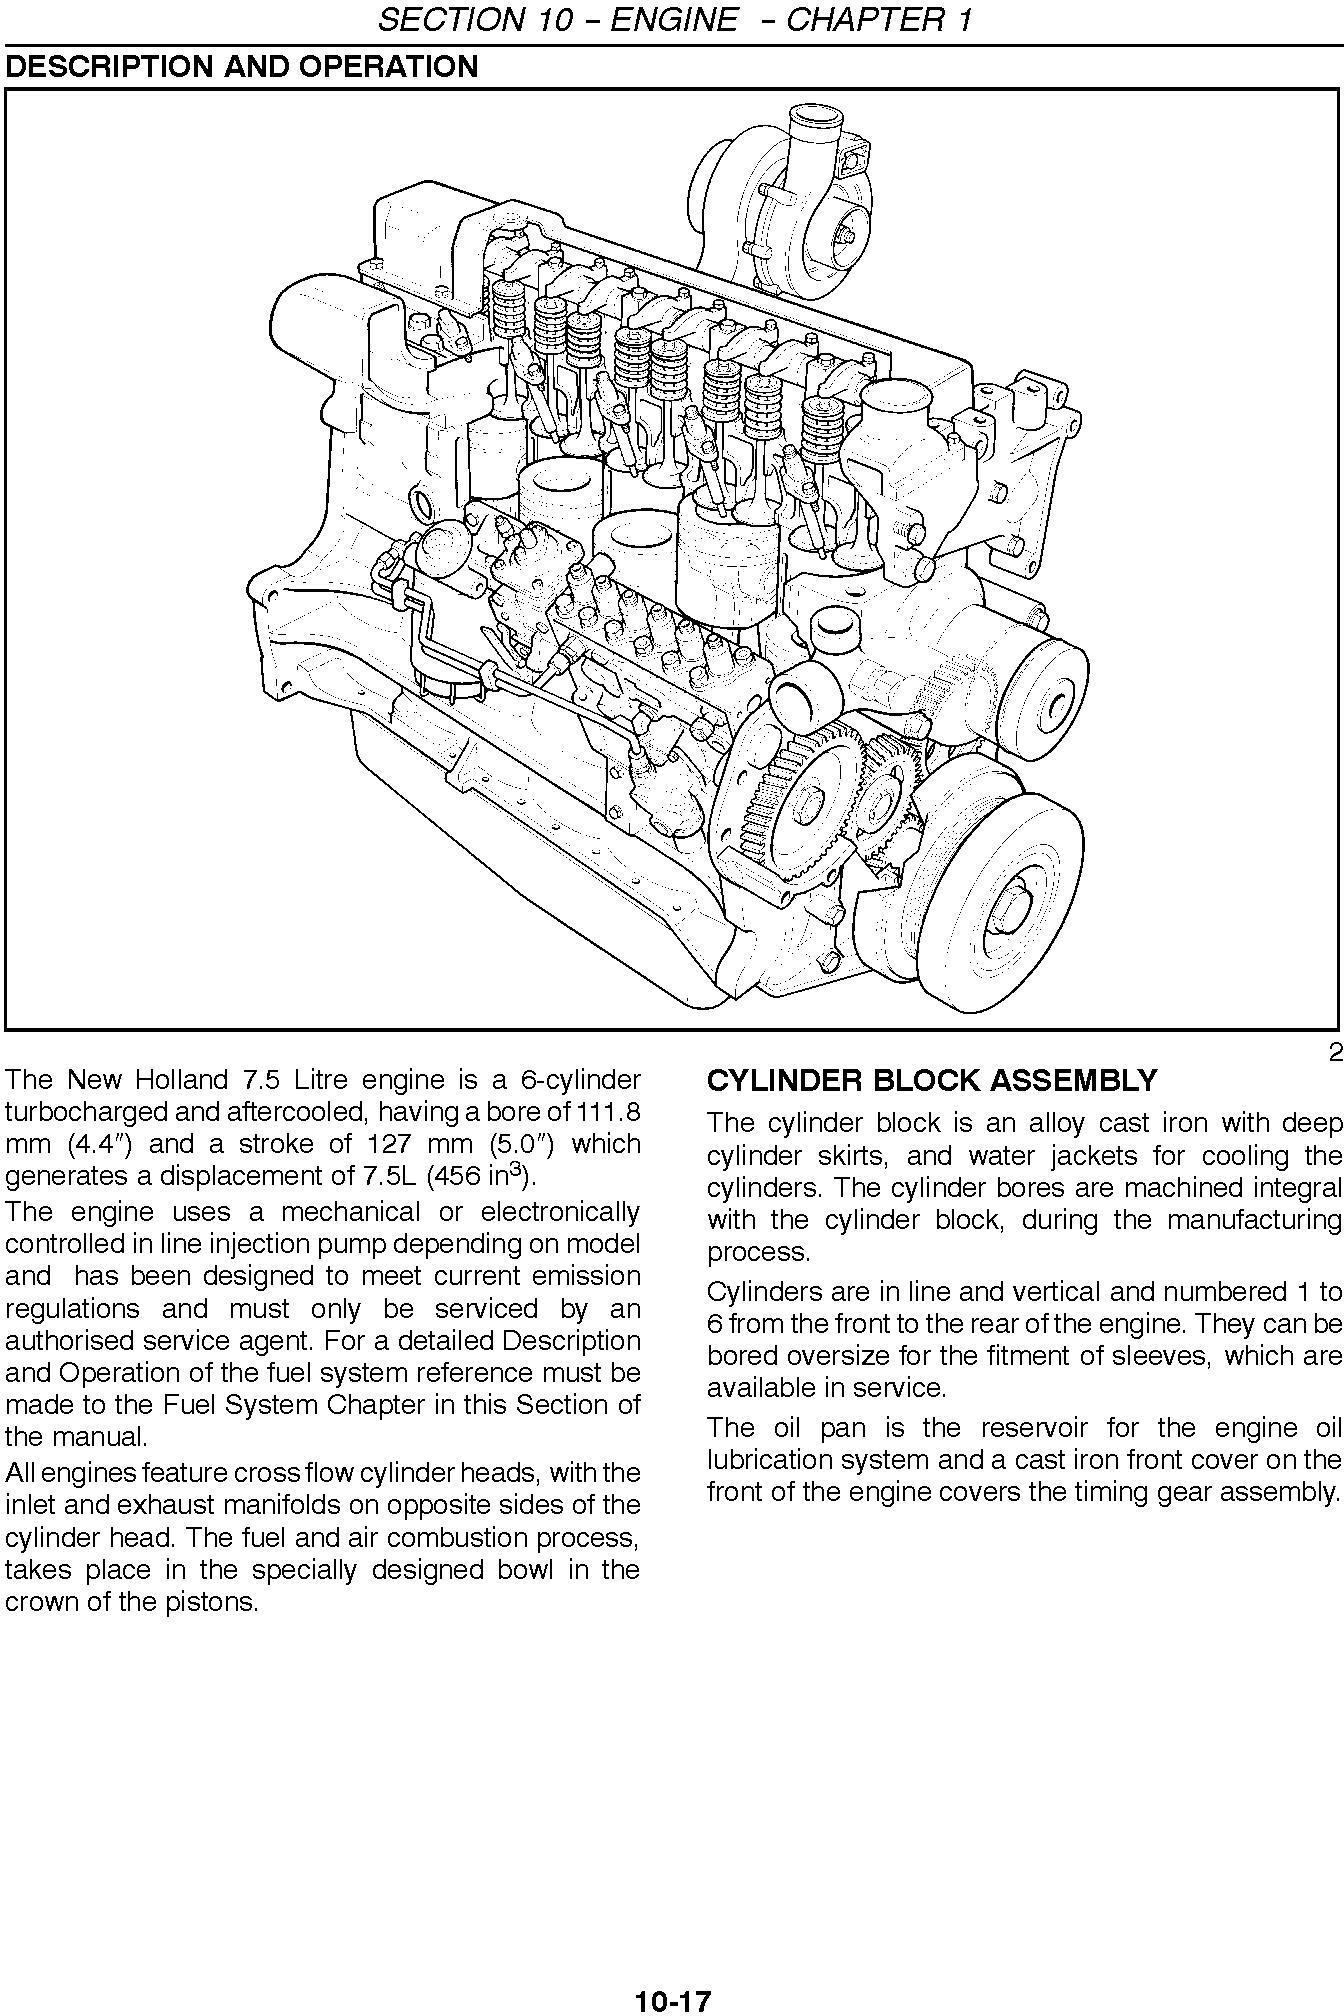 New Holland CX720, CX740, CX760, CX780, CX820, CX840, CX860, CX880 Combine Service Manual - 1